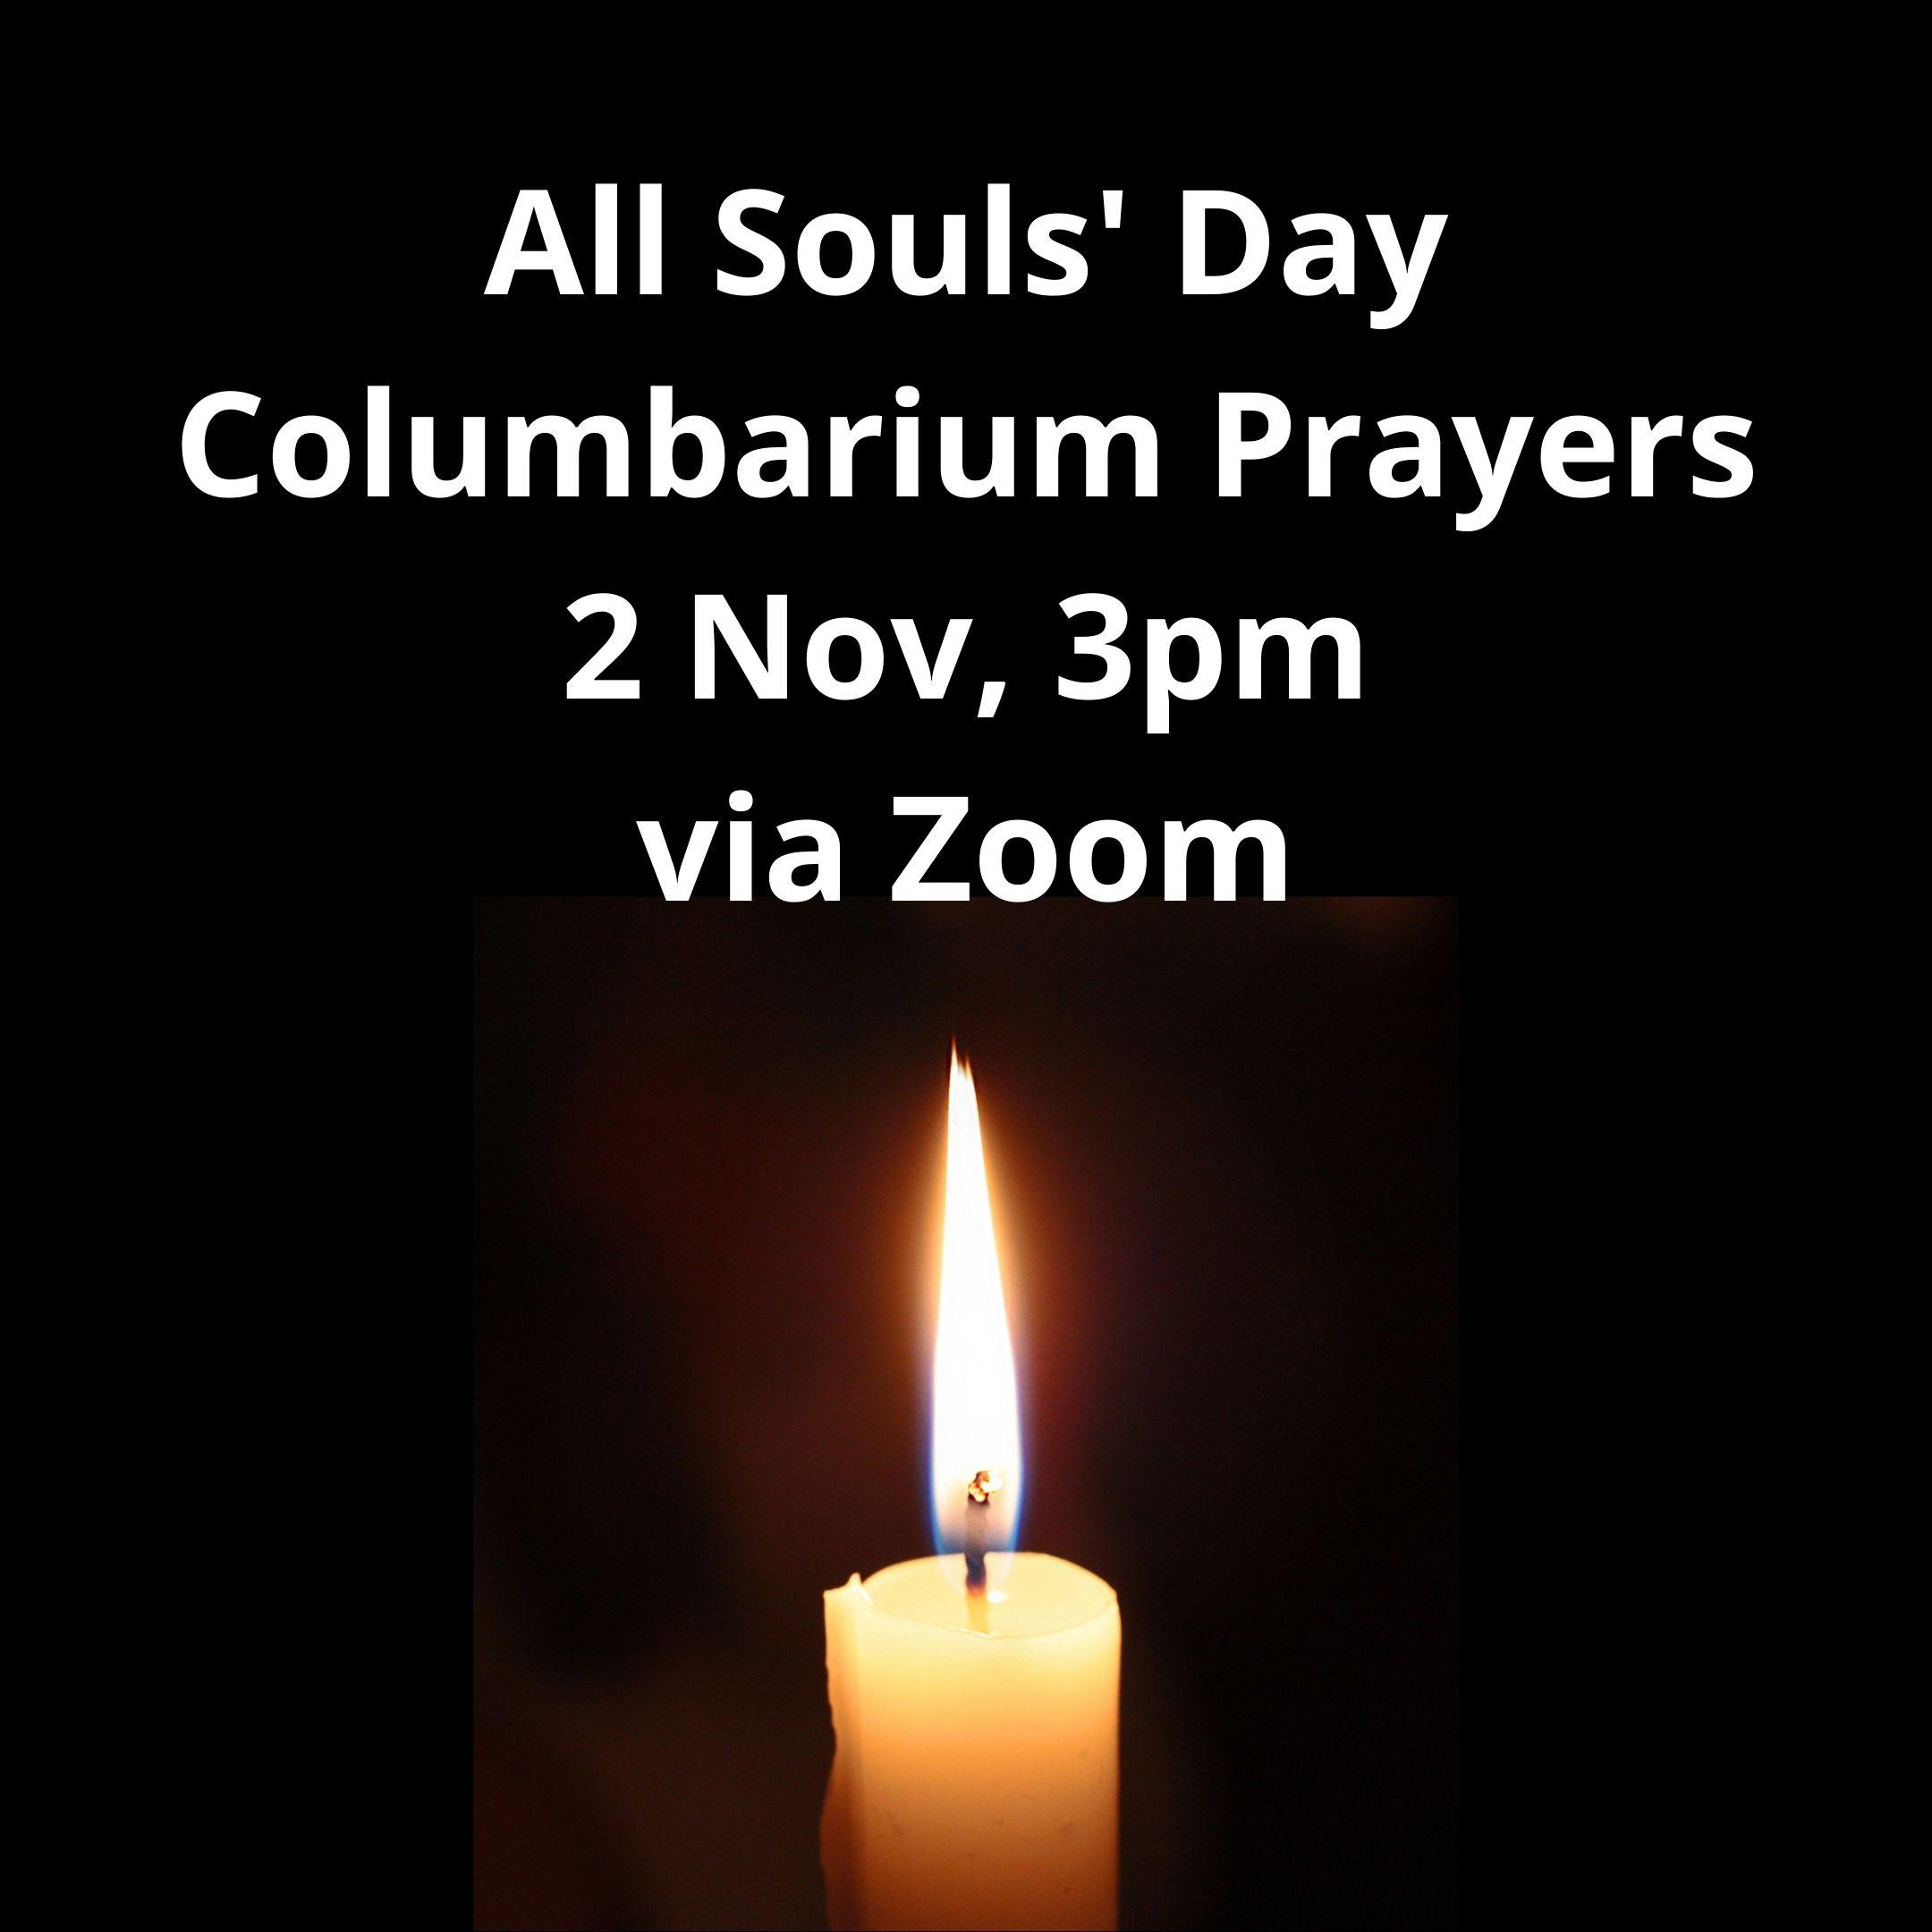 ALL SOULS' DAY Columbarium Prayers